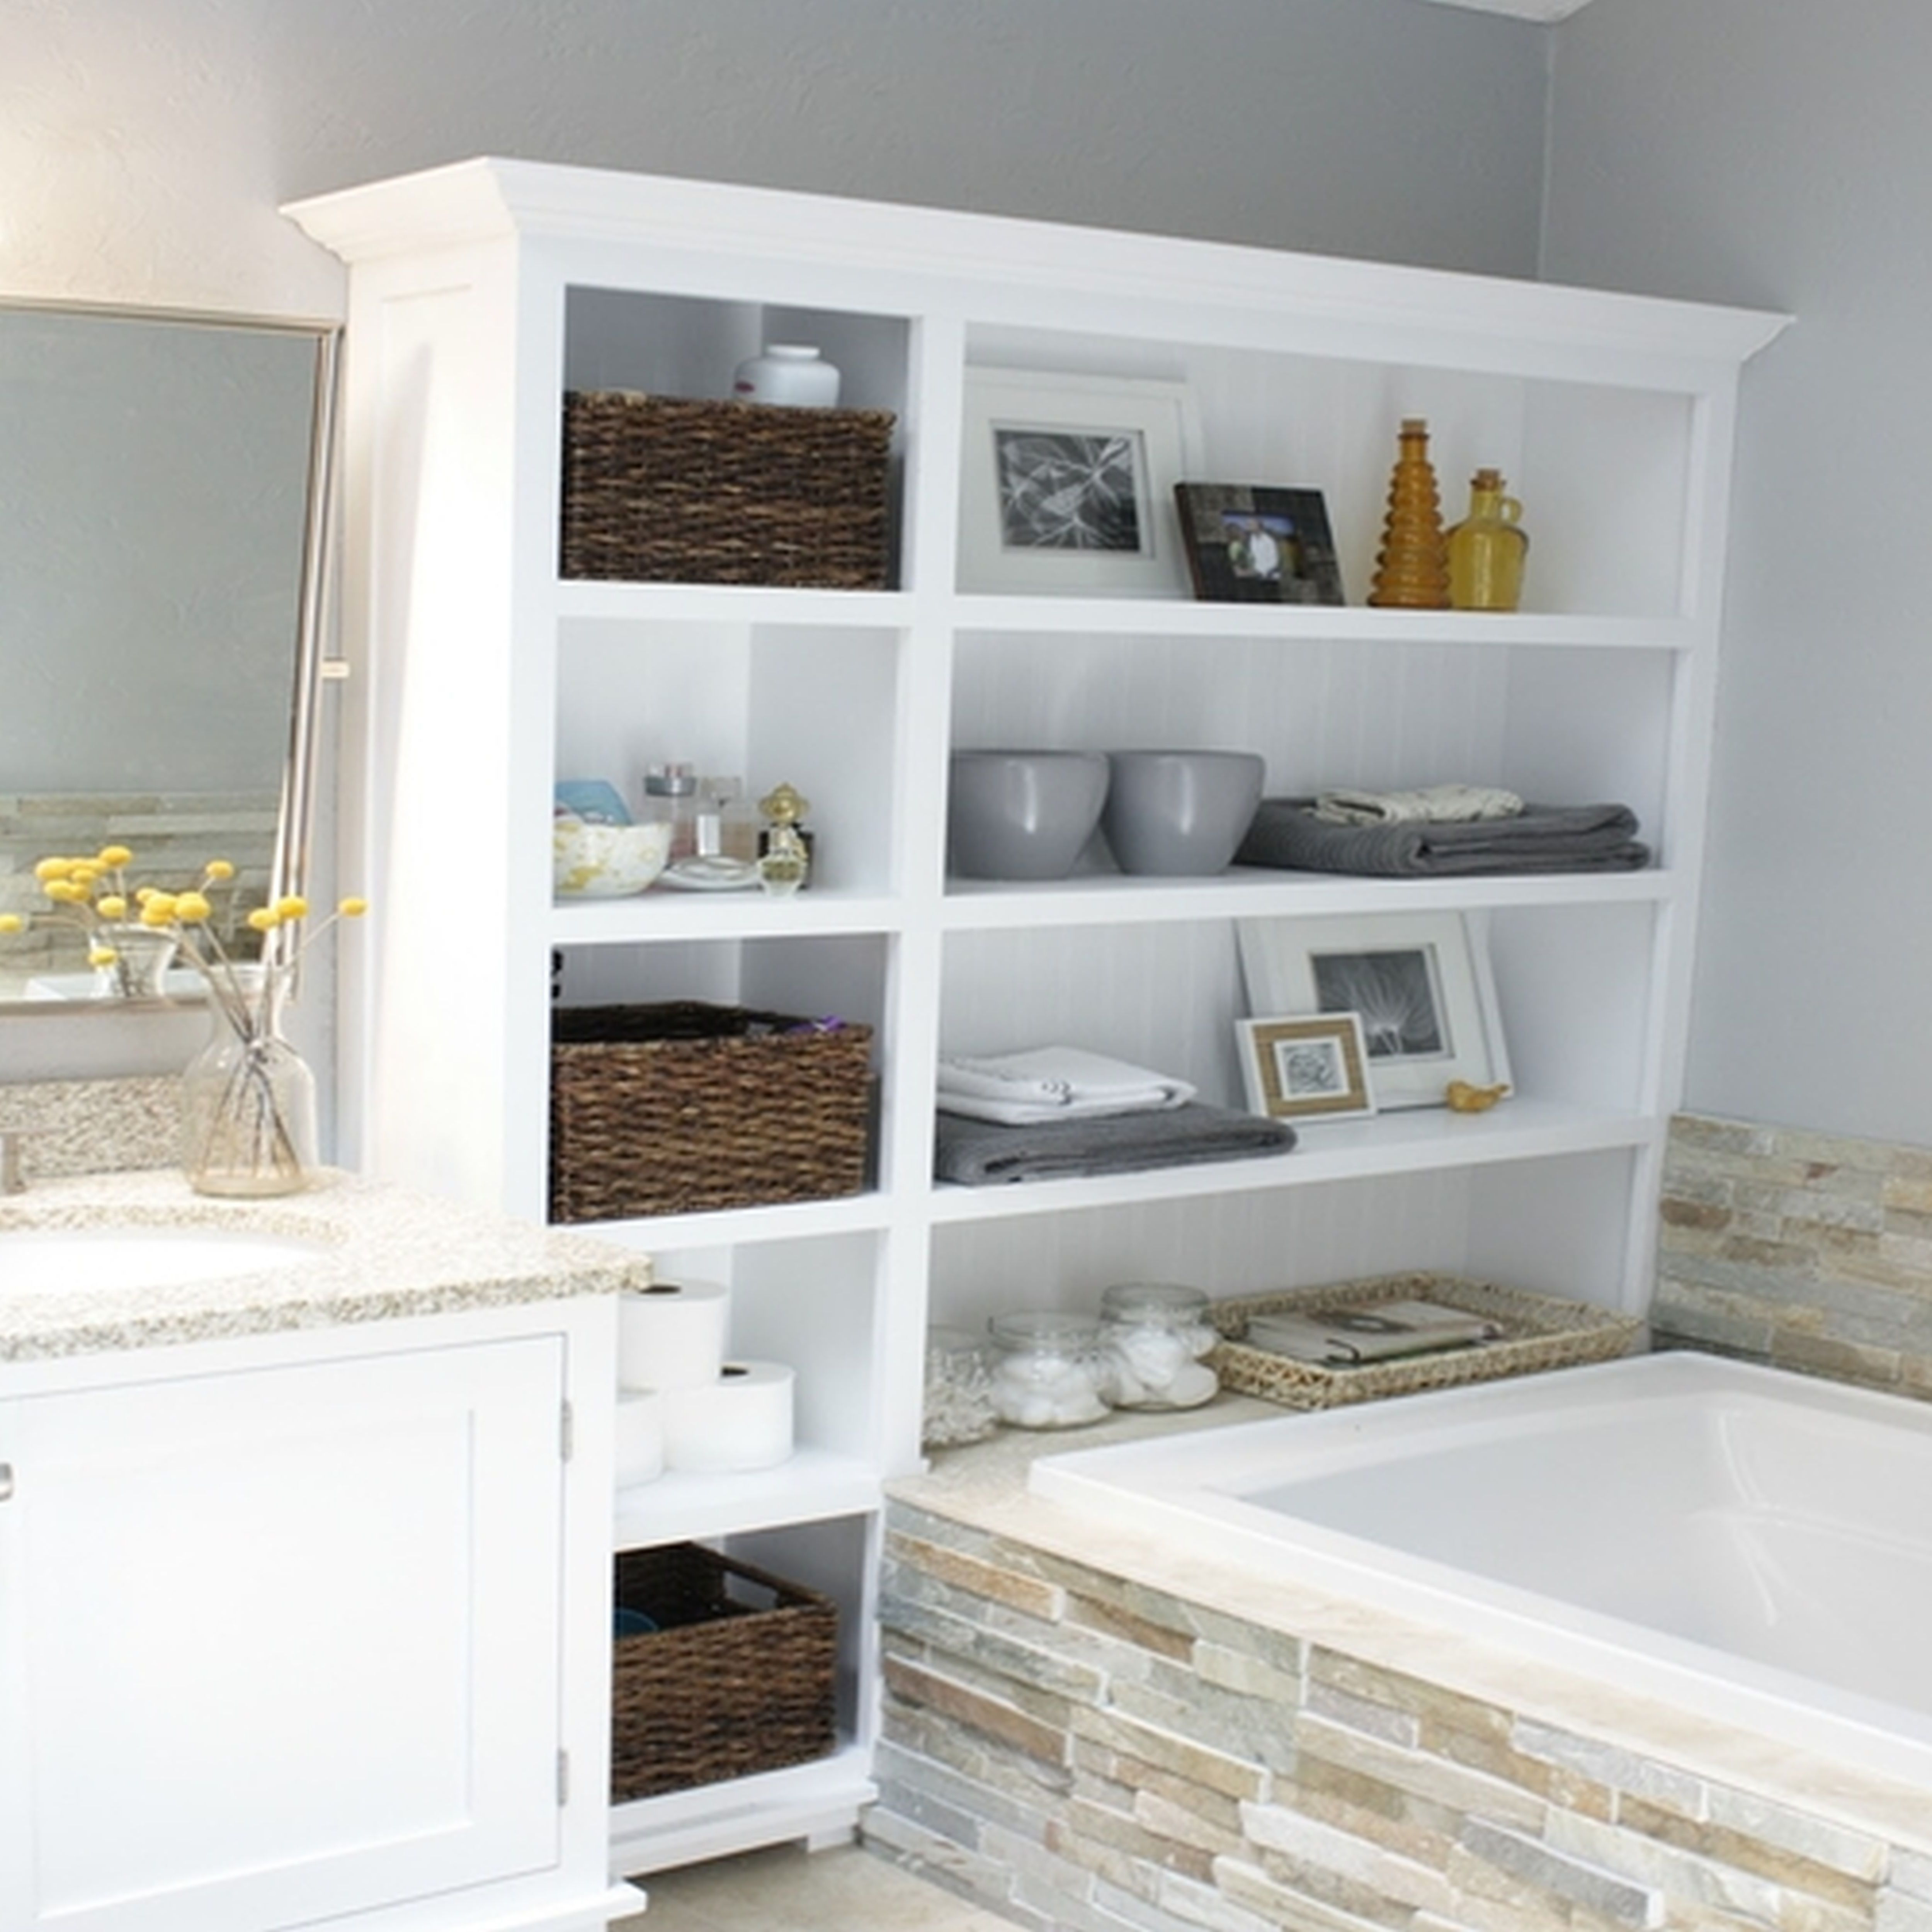 Smallbathroomremodelingideas  Bathroom Remodeling Ideas Entrancing Storage Cabinets For Small Bathrooms 2018